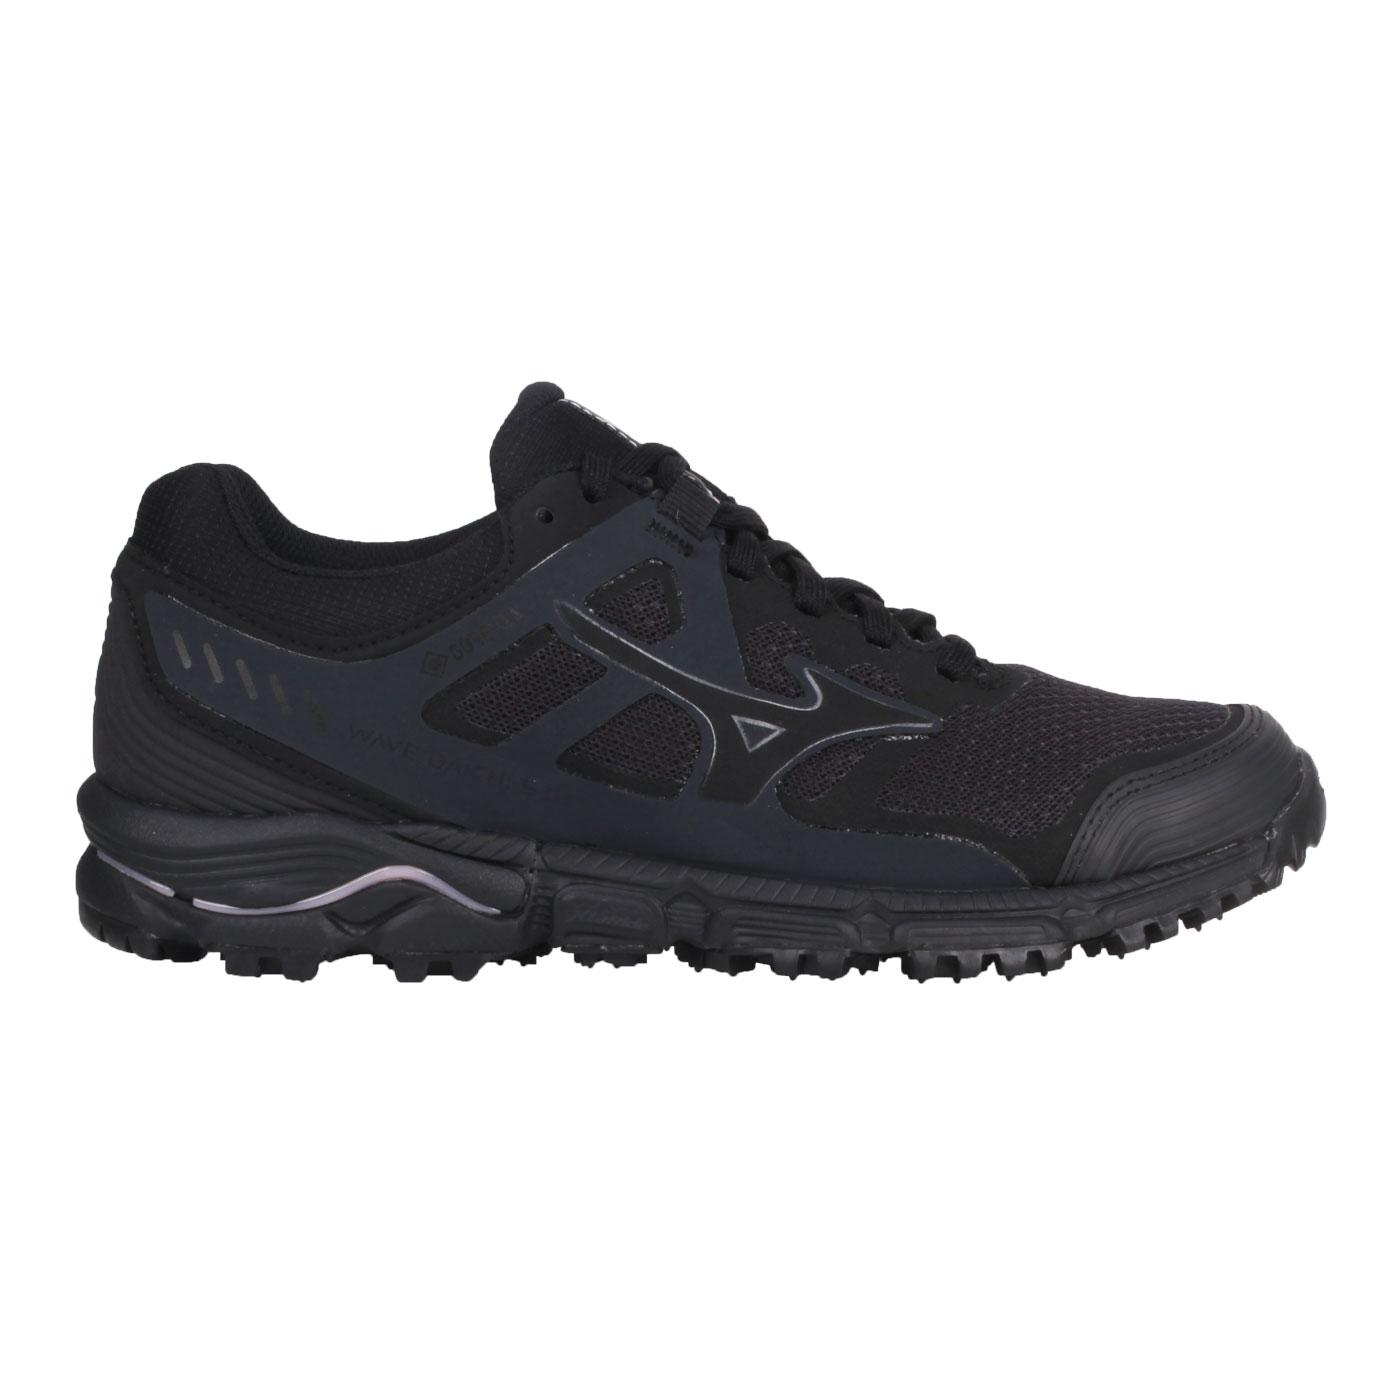 MIZUNO 女款越野慢跑鞋  @WAVE DAICHI 5 GTX@J1GK205609 - 黑